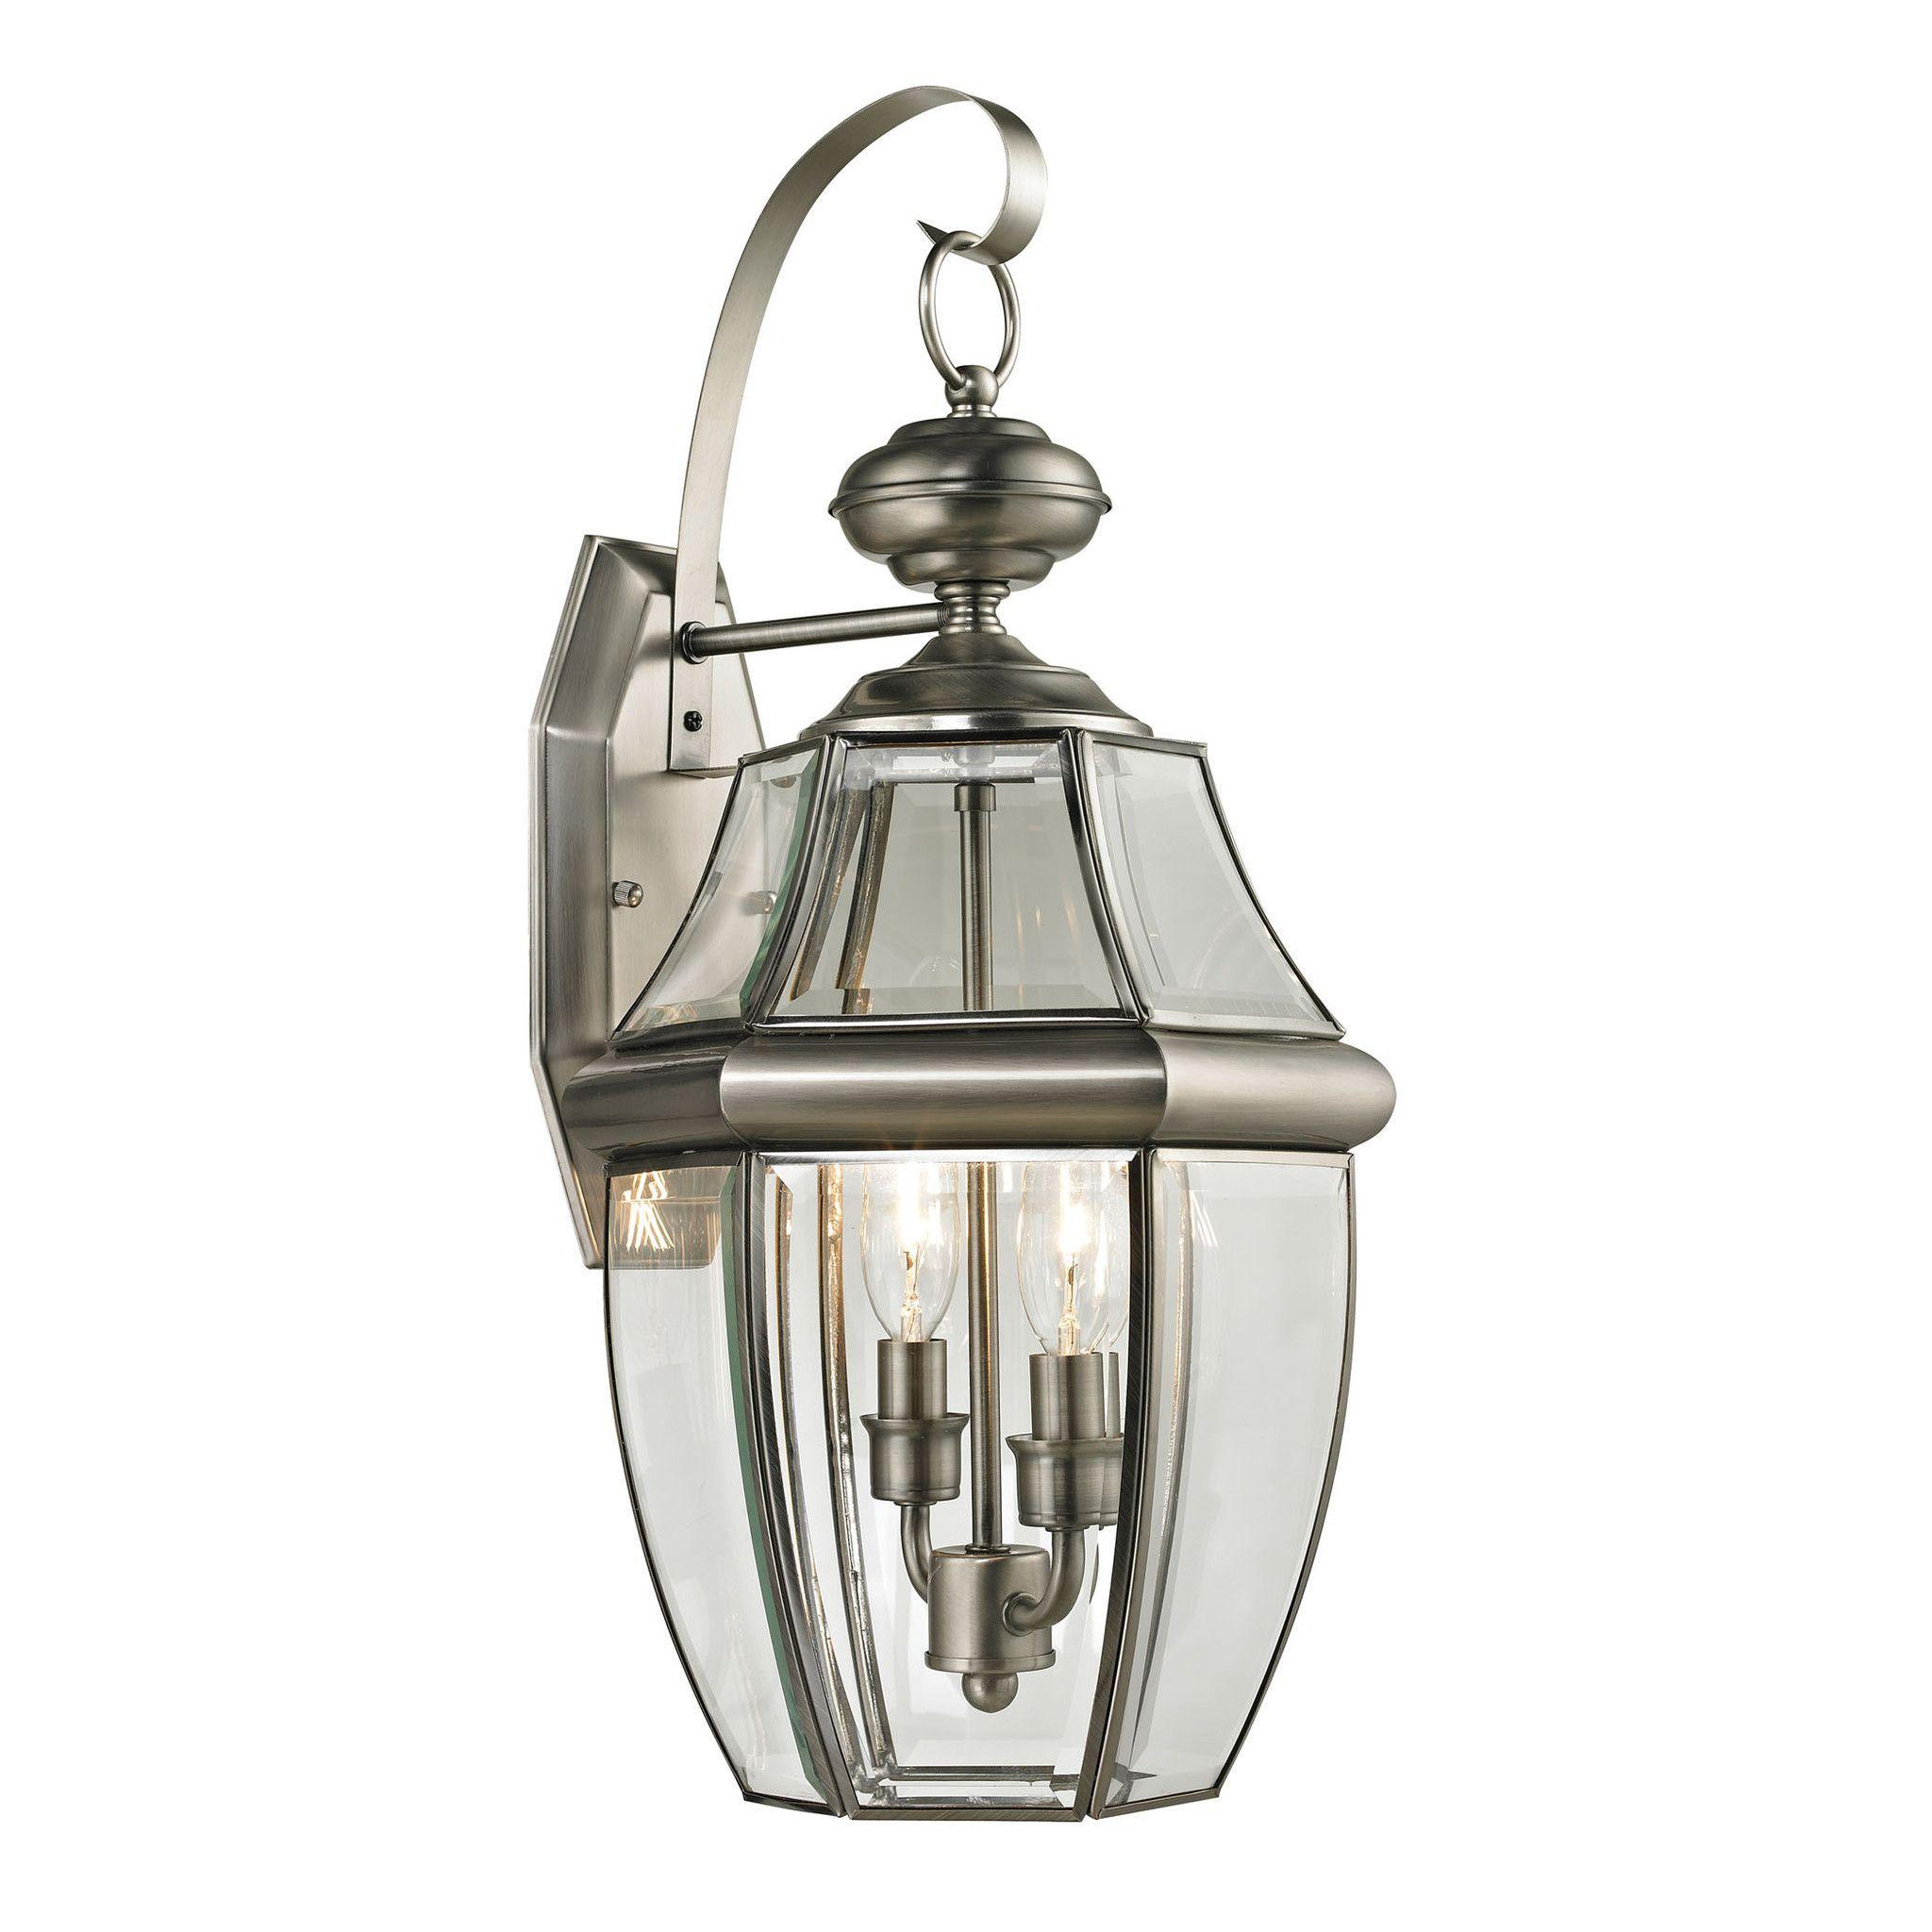 outdoor bedc ip wall com aged lamp bronze industries finish litex coach walmart fixture lighting pack outdoors light